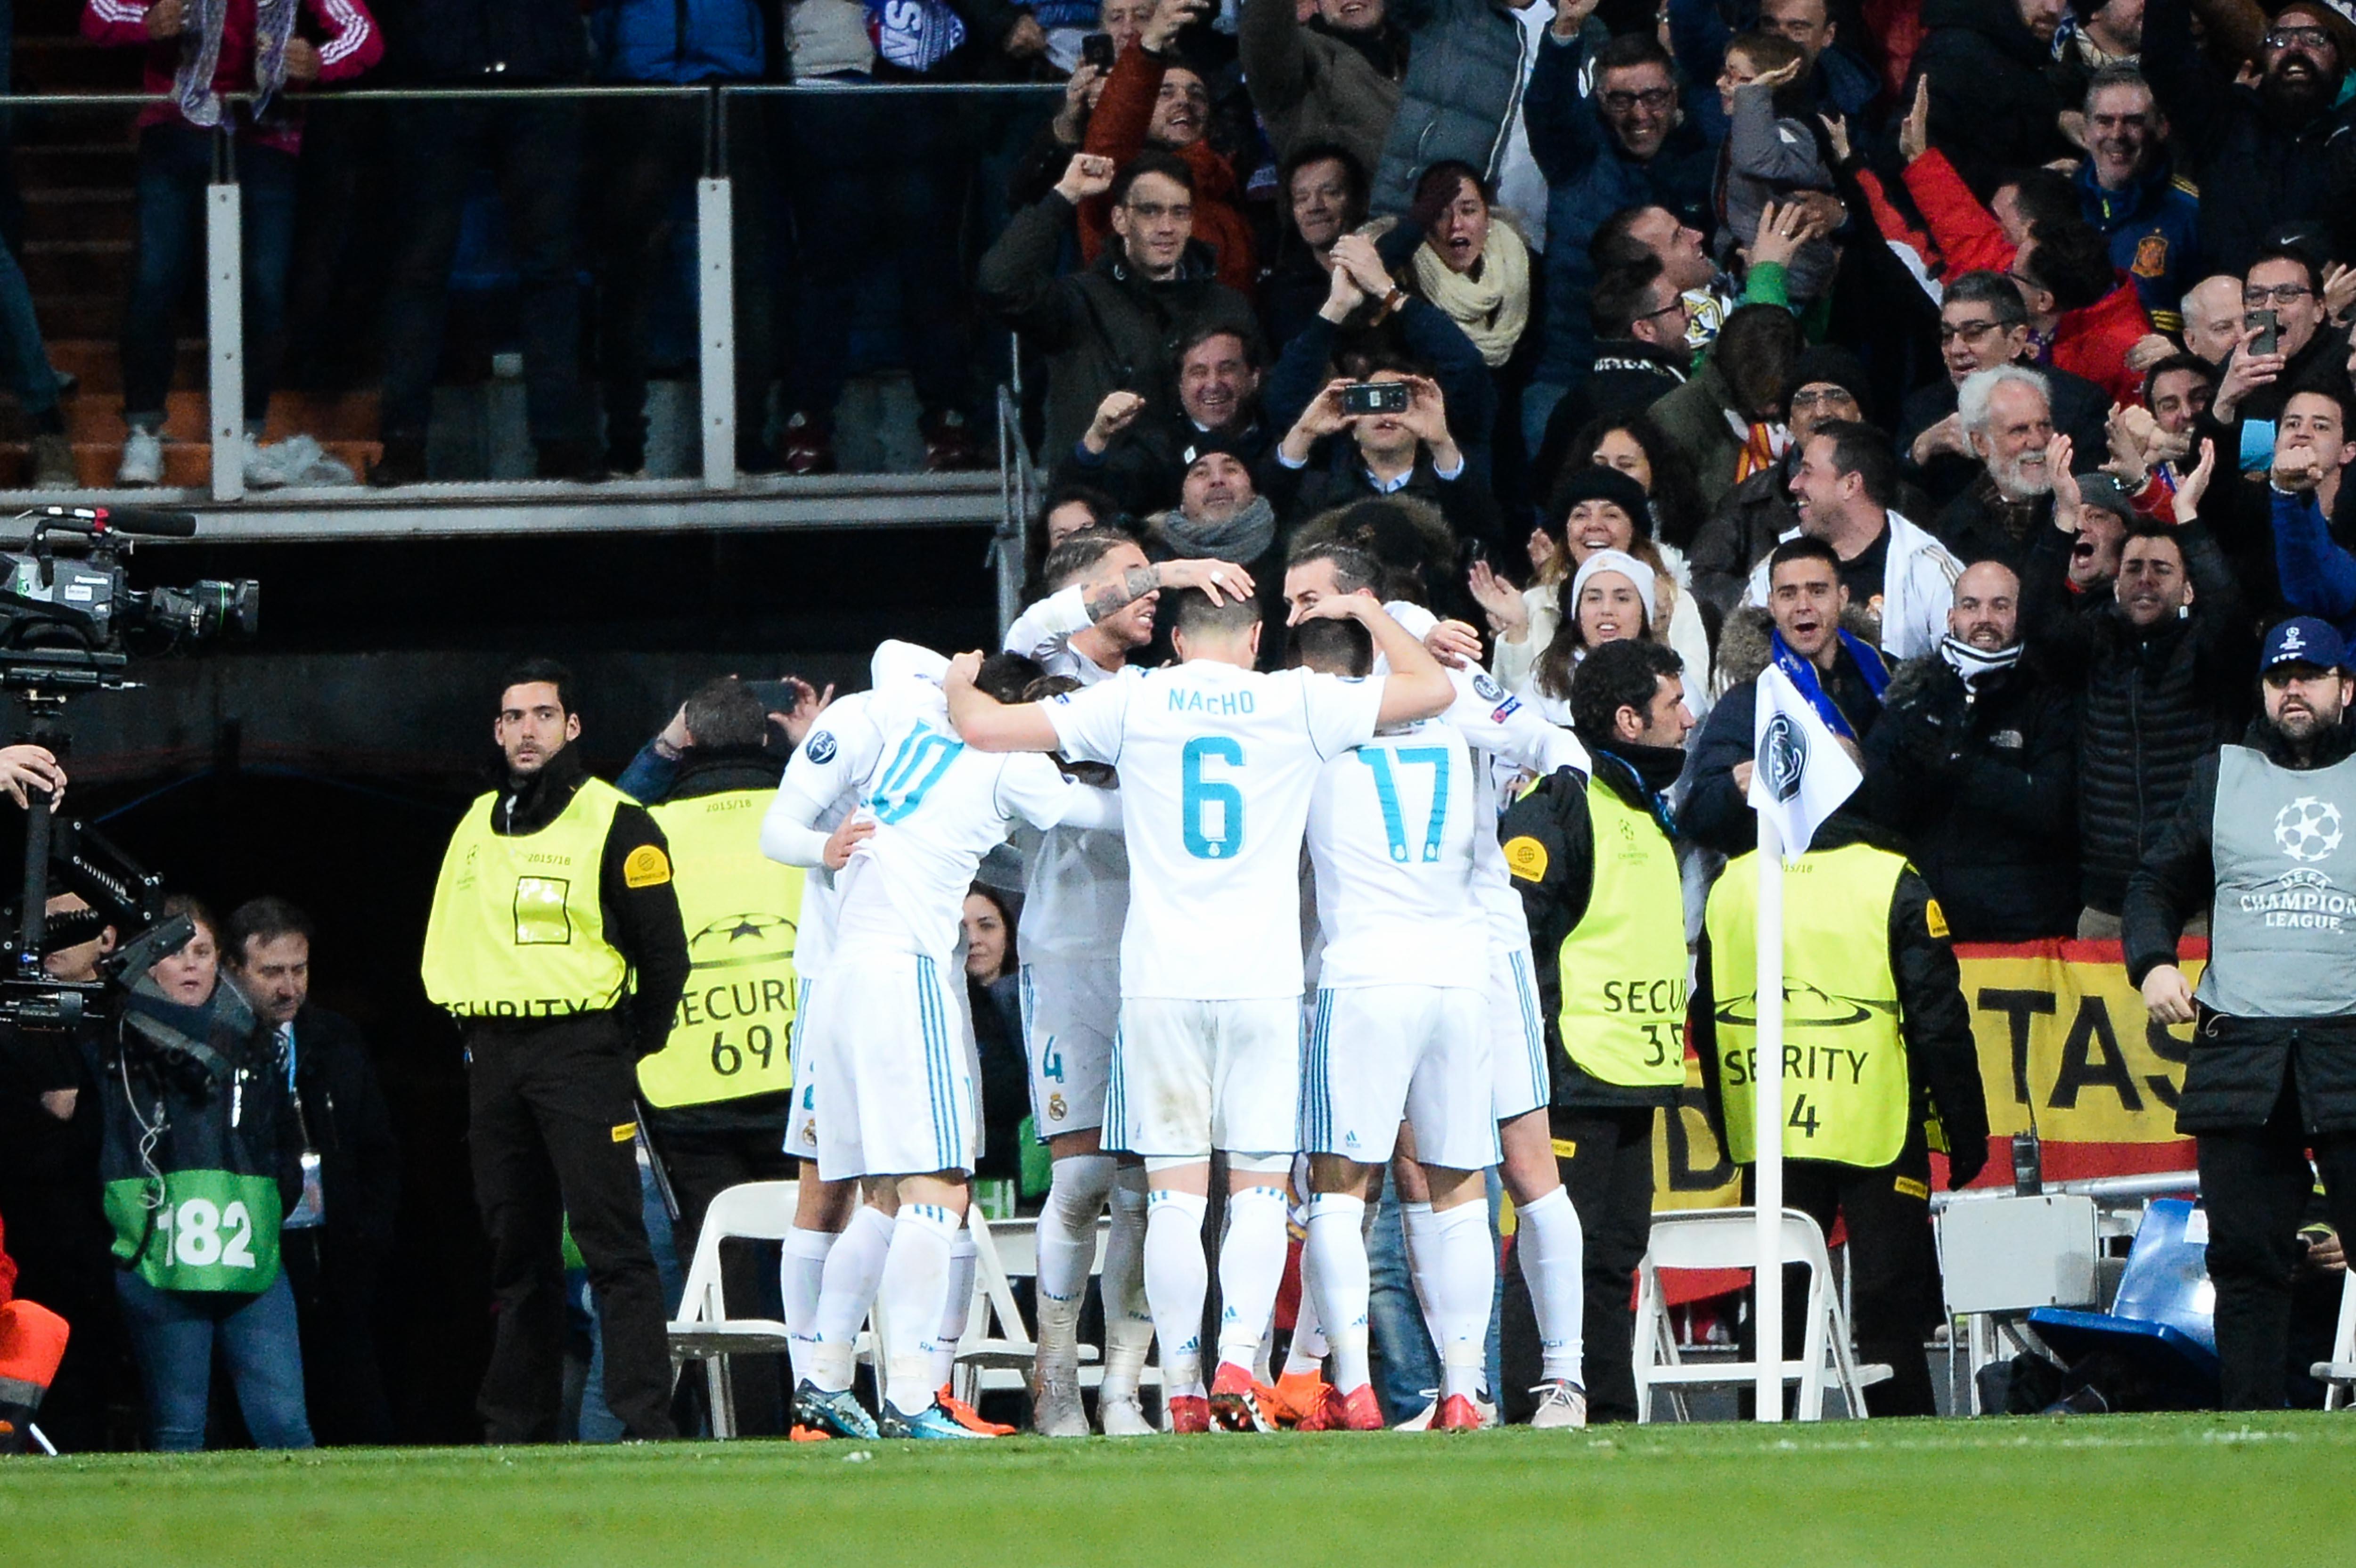 Real Madrid squad